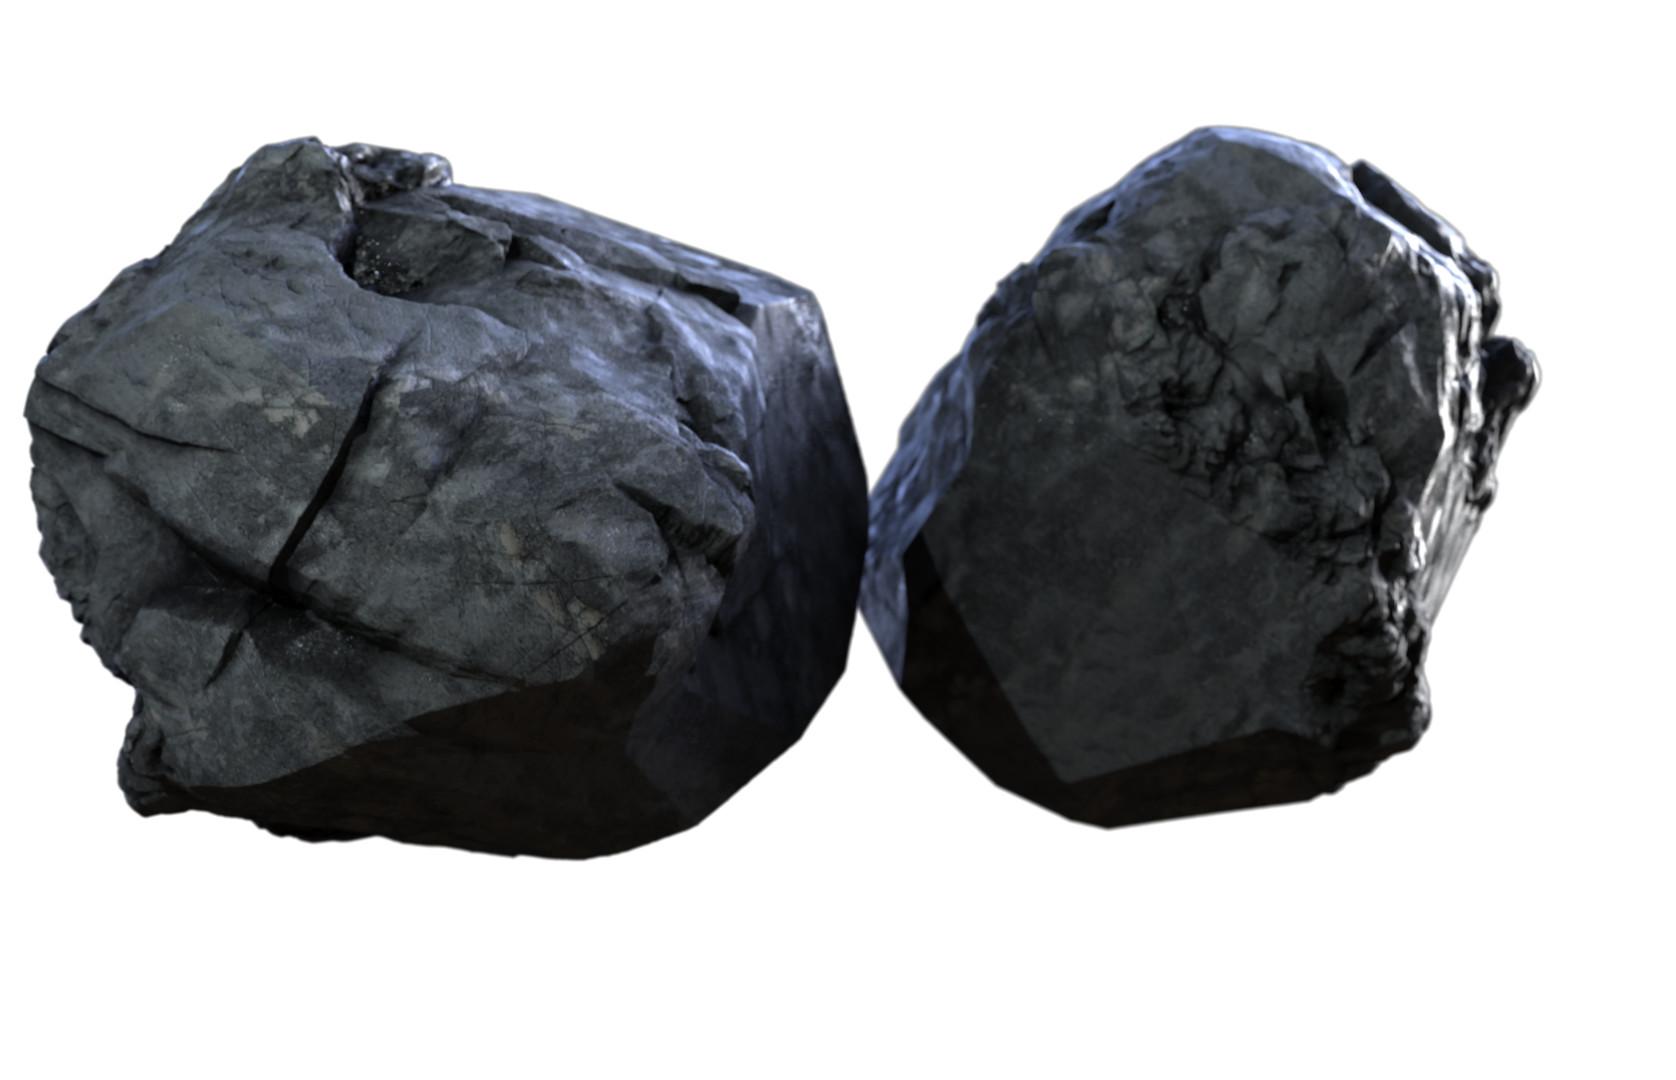 Rock4%20%28large%29